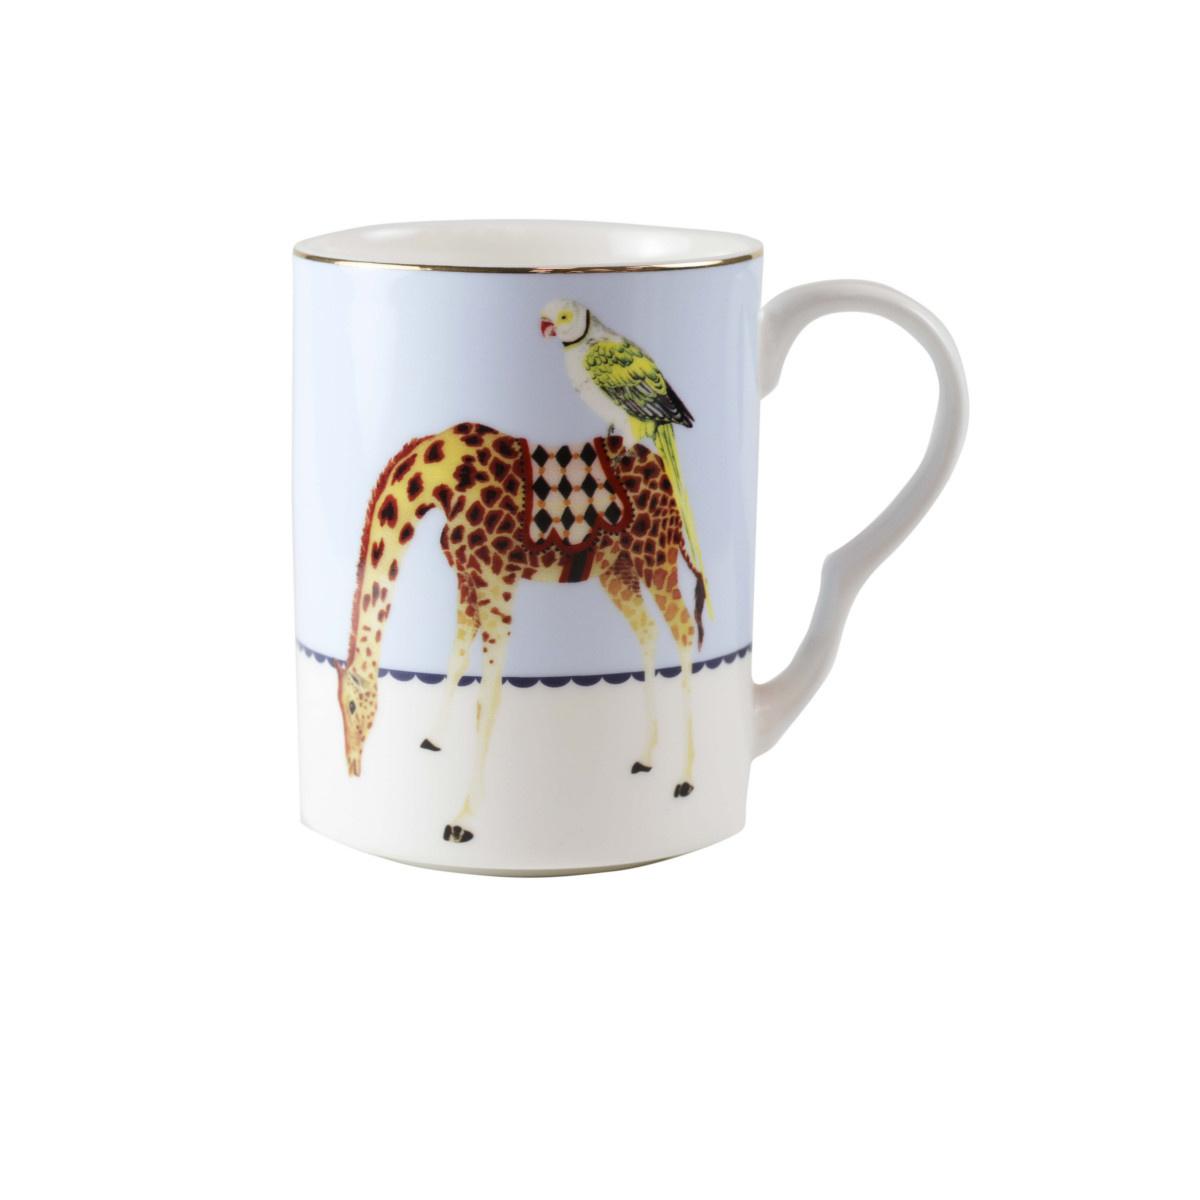 Yvonne Ellen London Yvonne Ellen London Carnival Animal Set de 2 Mugs 375 ml - Bone China Porcelaine - Boîte de Cadeau